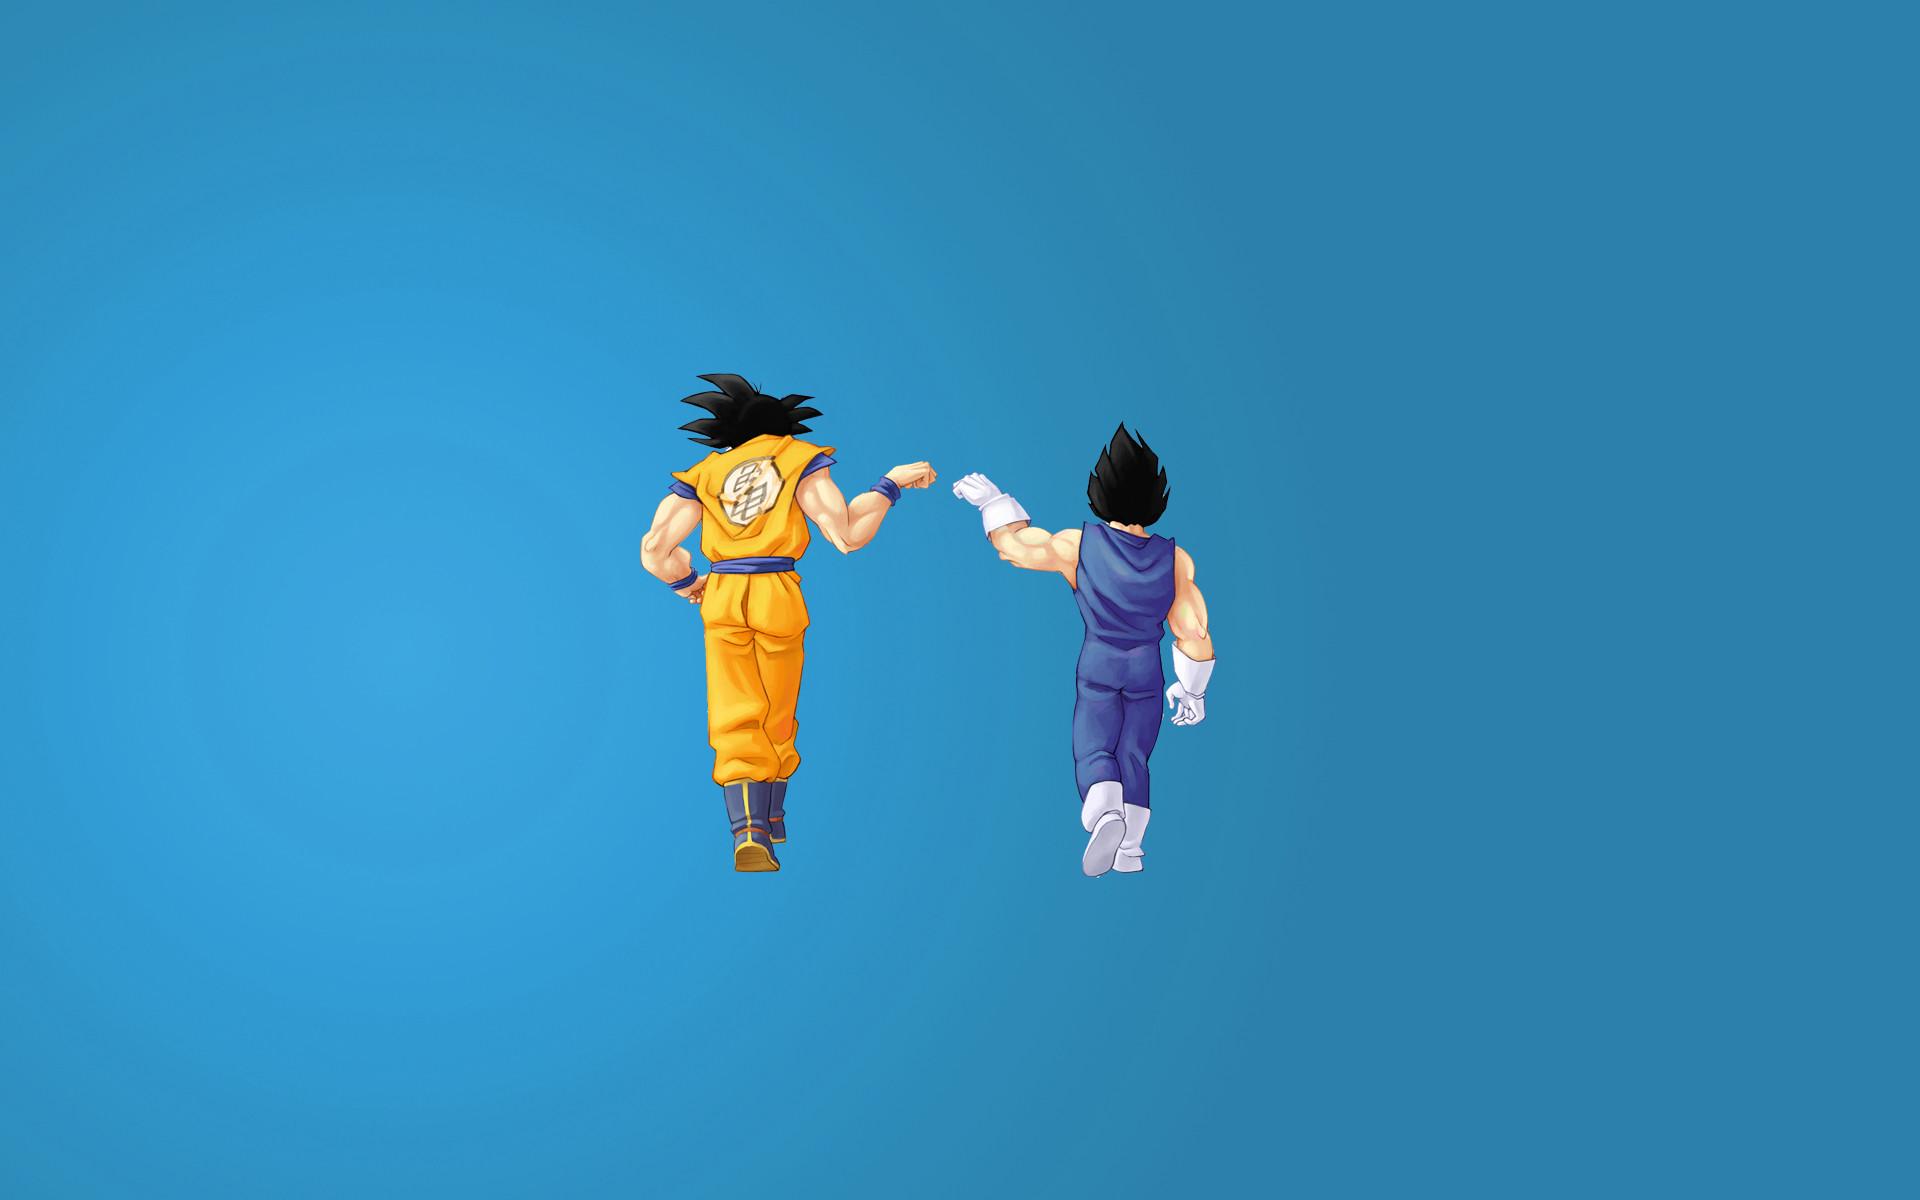 Goku vs Vegeta Iphone Wallpaper Vegeta Goku Wallpaper